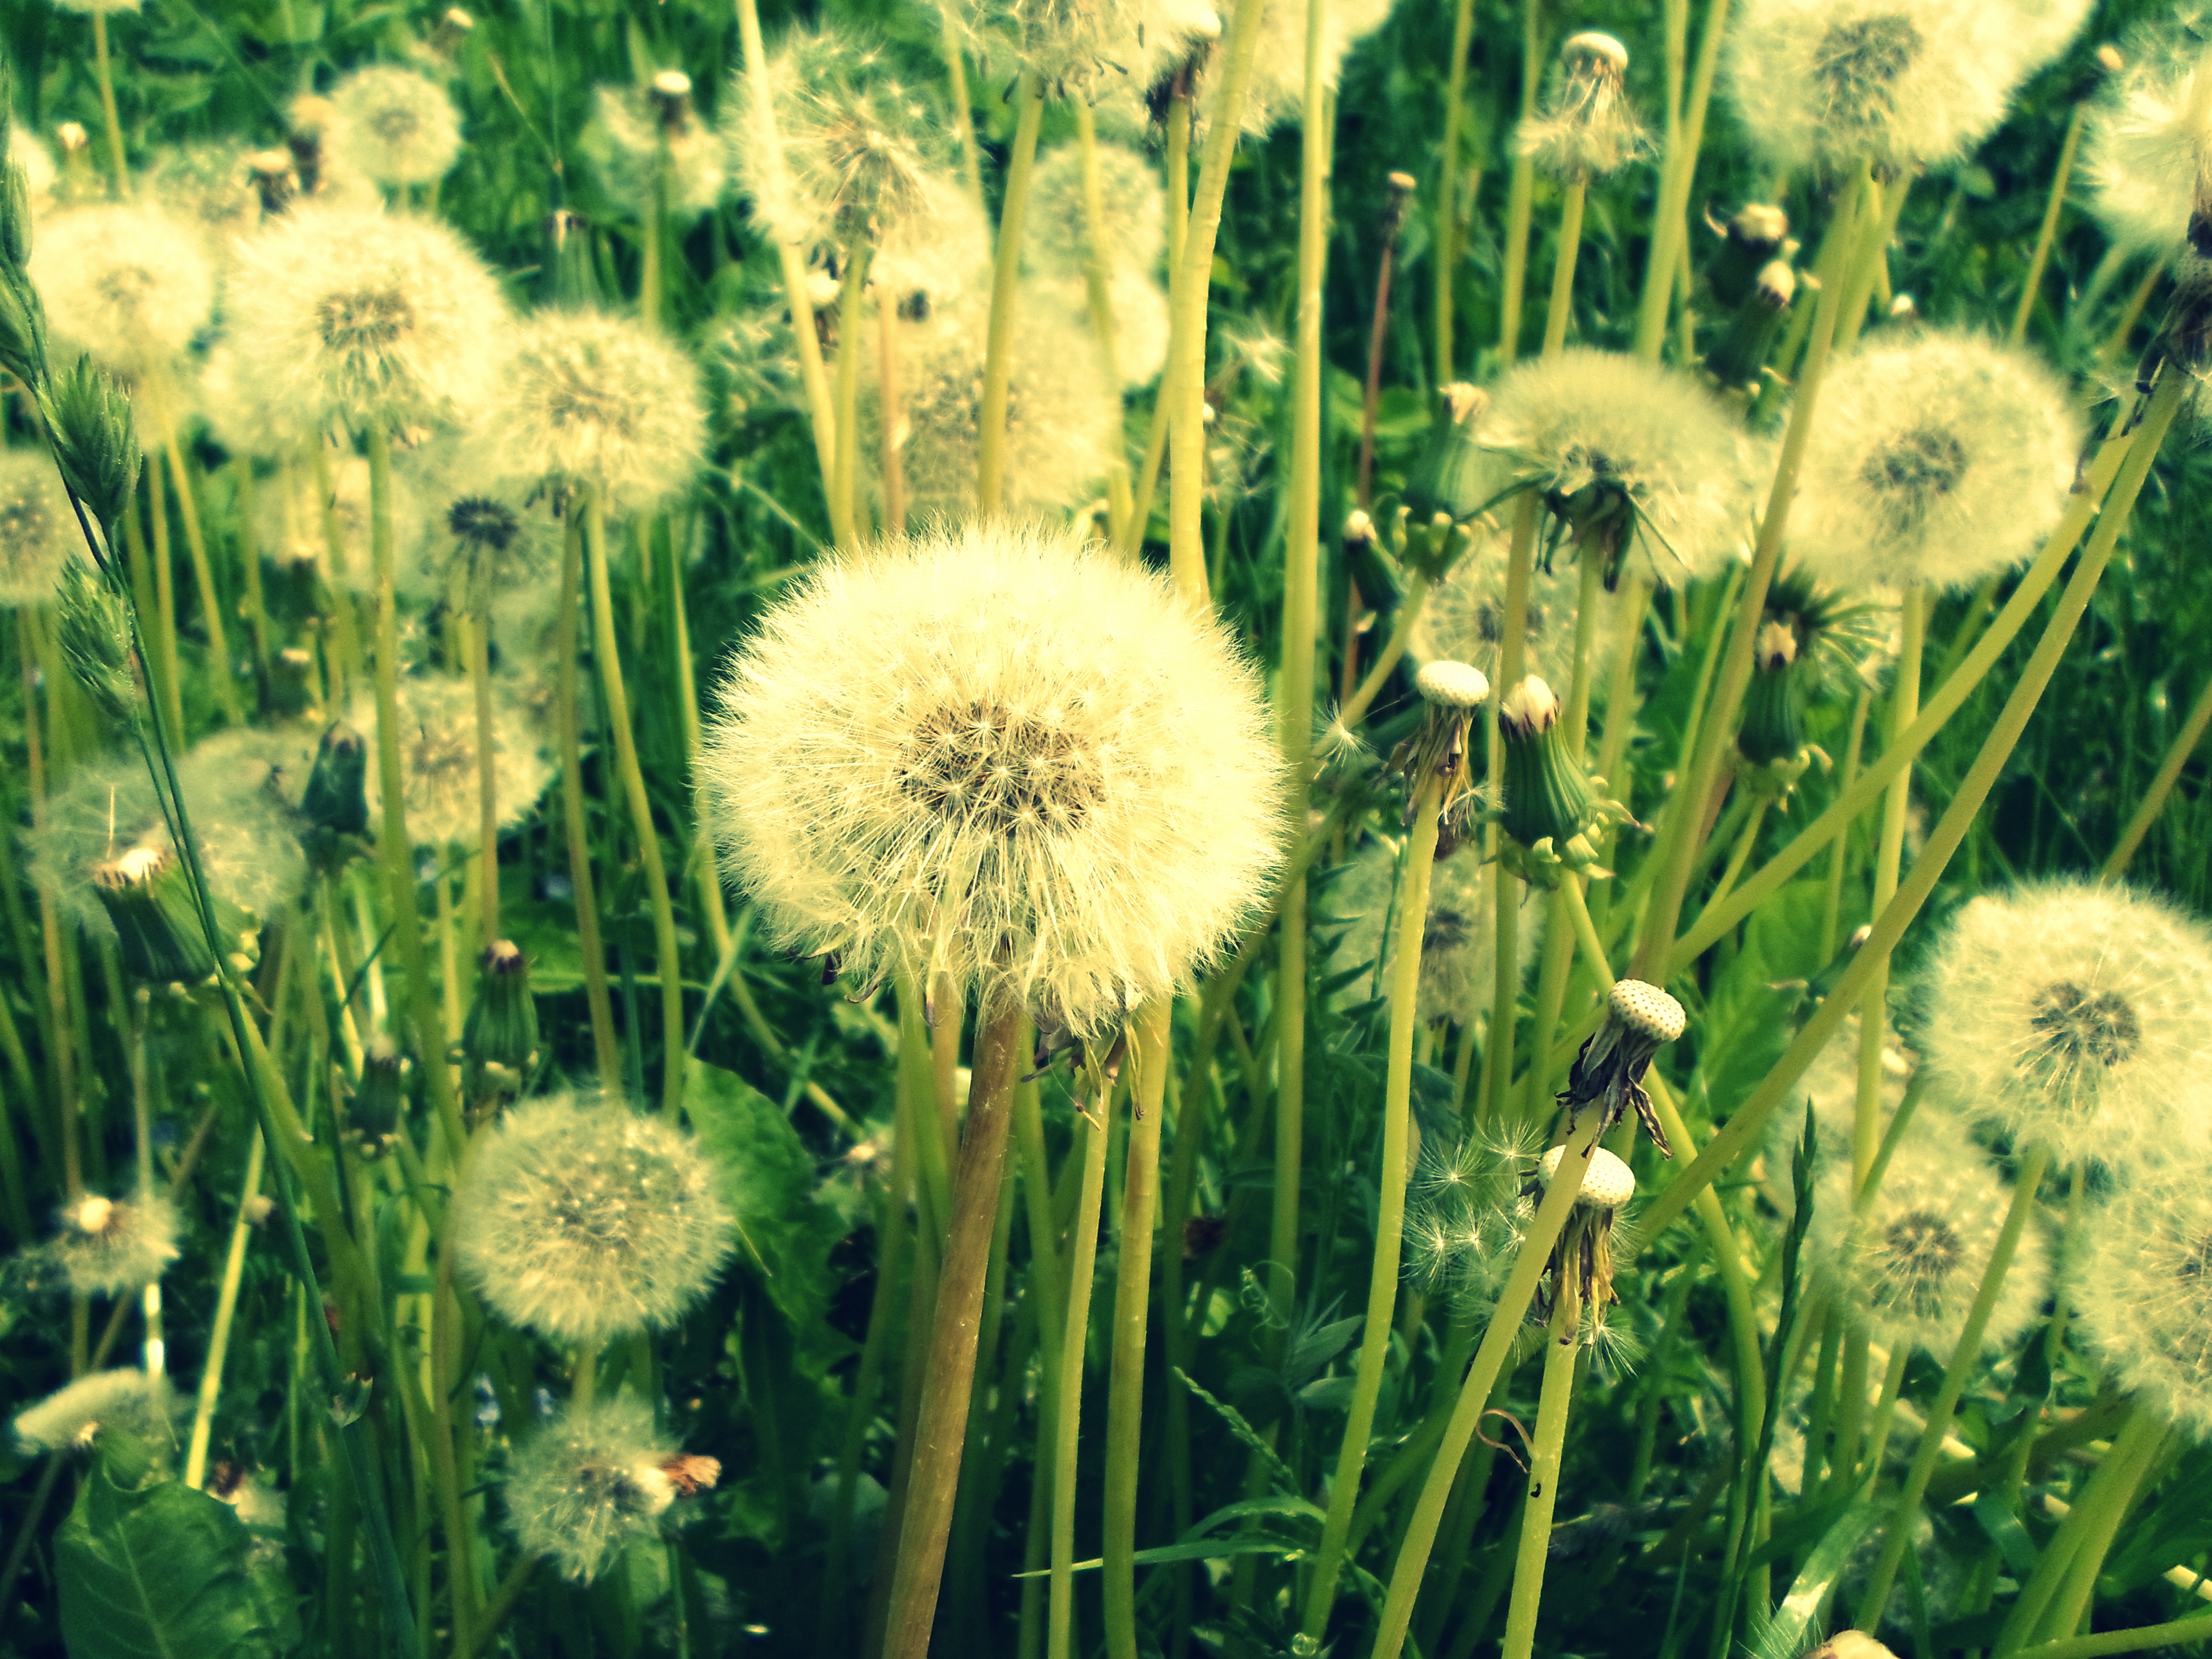 Dandelions by drunkbunneh